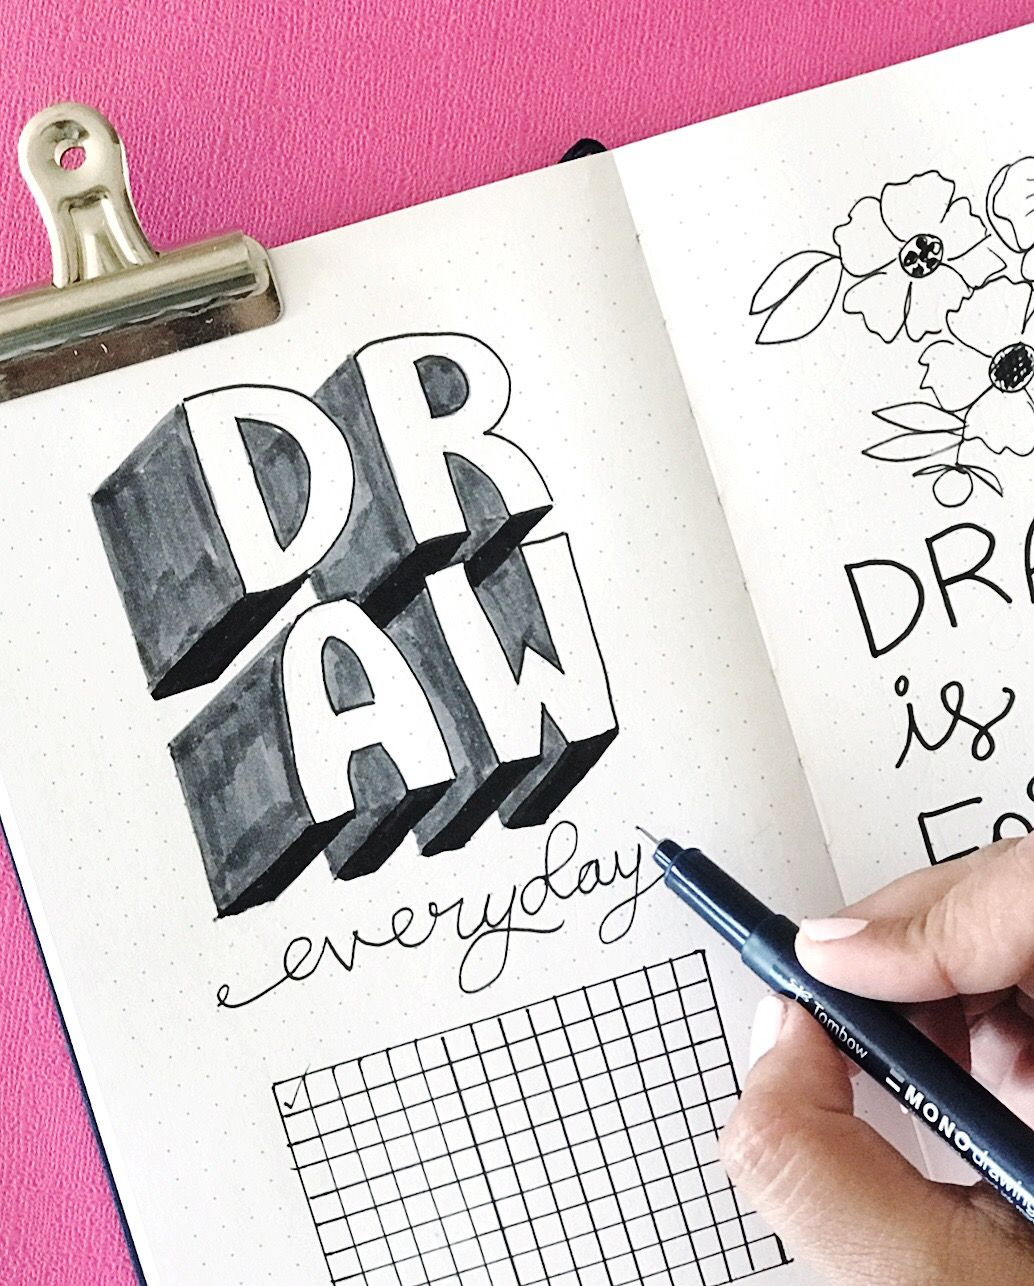 Smitha Katti Archer Olive Dot Journaling Ideas Black And